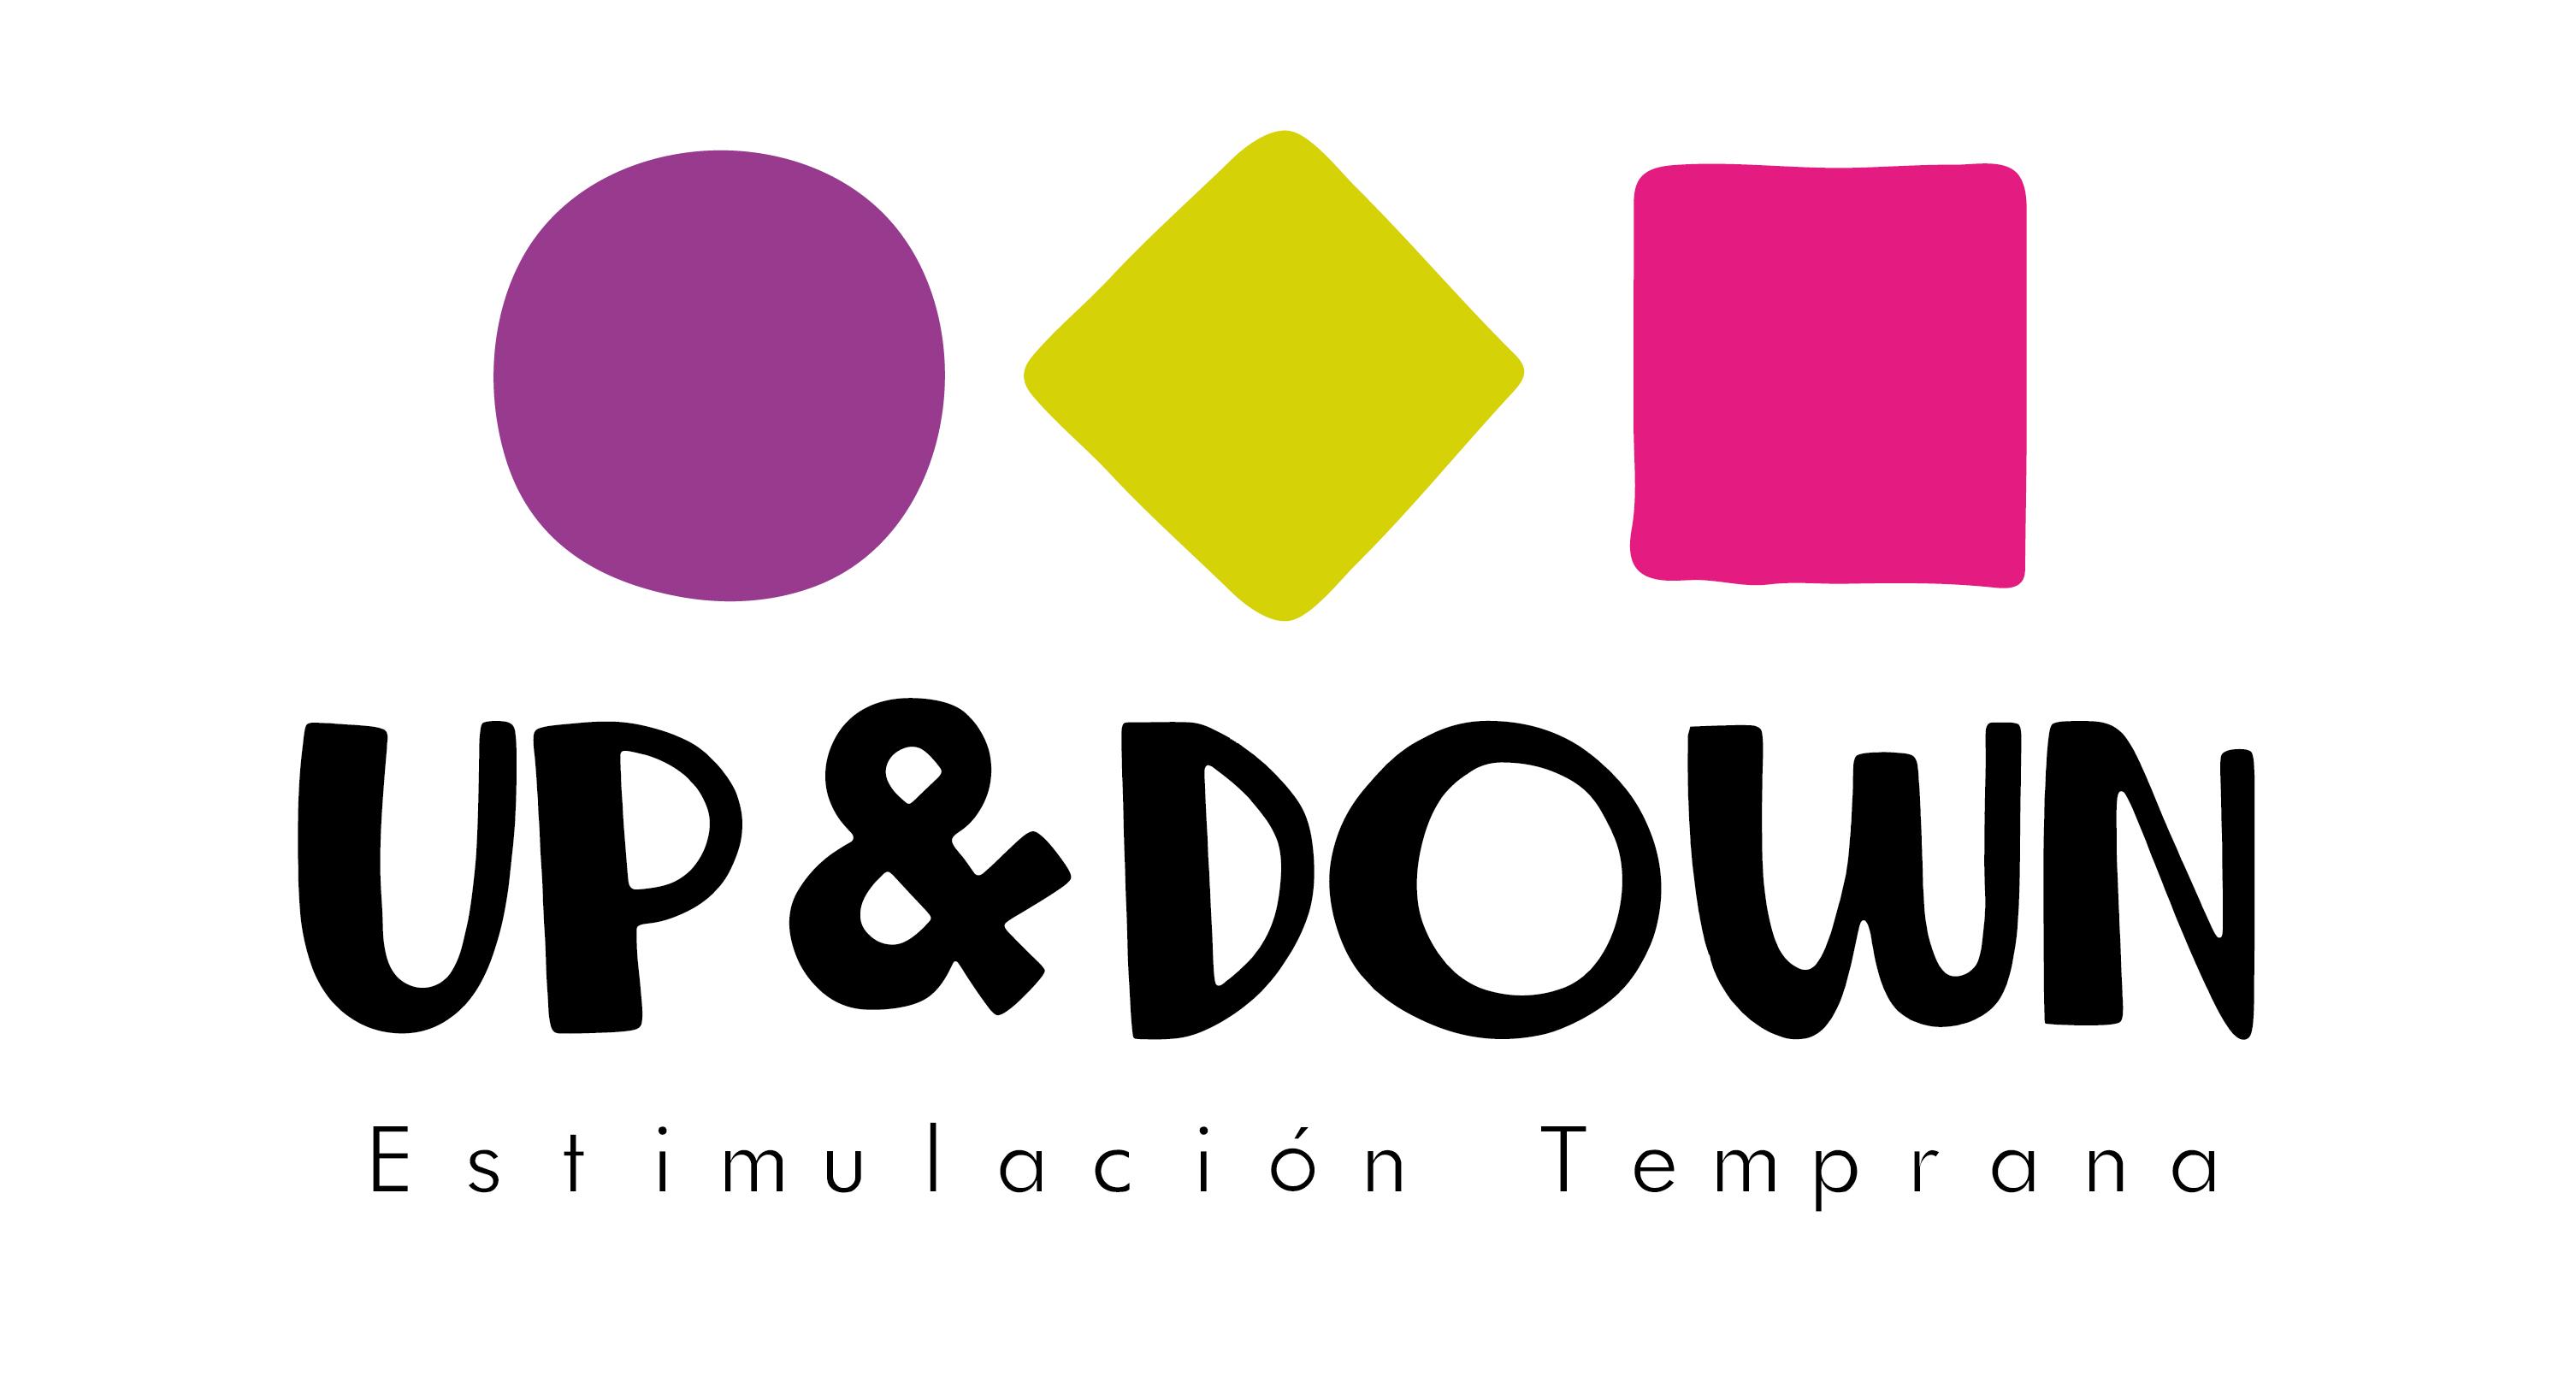 UP&DOWN VERACRUZ. Centro de Estimulación Temprana